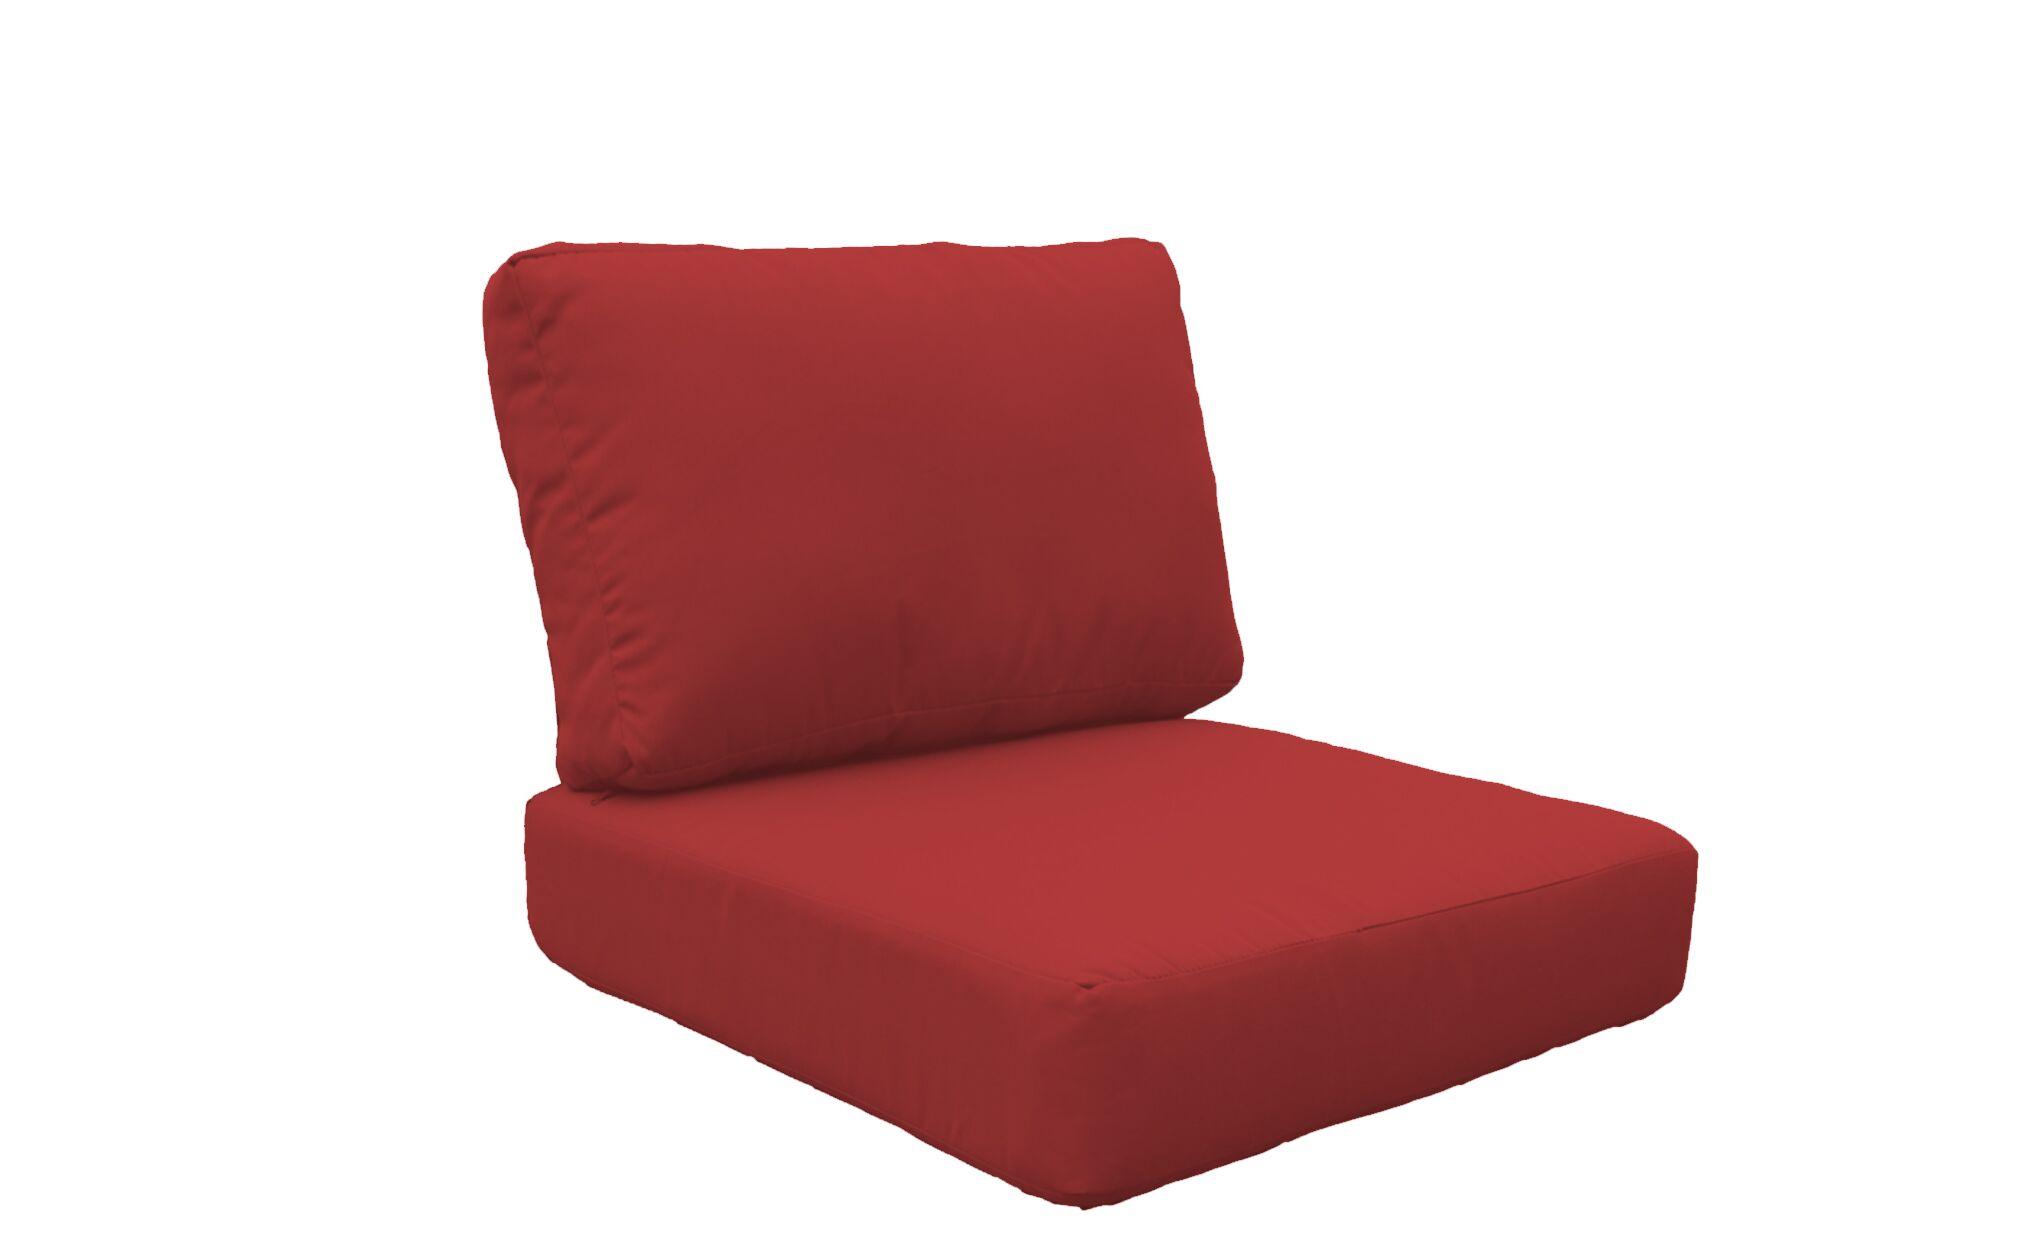 Miami 10 Piece Outdoor Lounge Chair Cushion Set Fabric: Terracotta